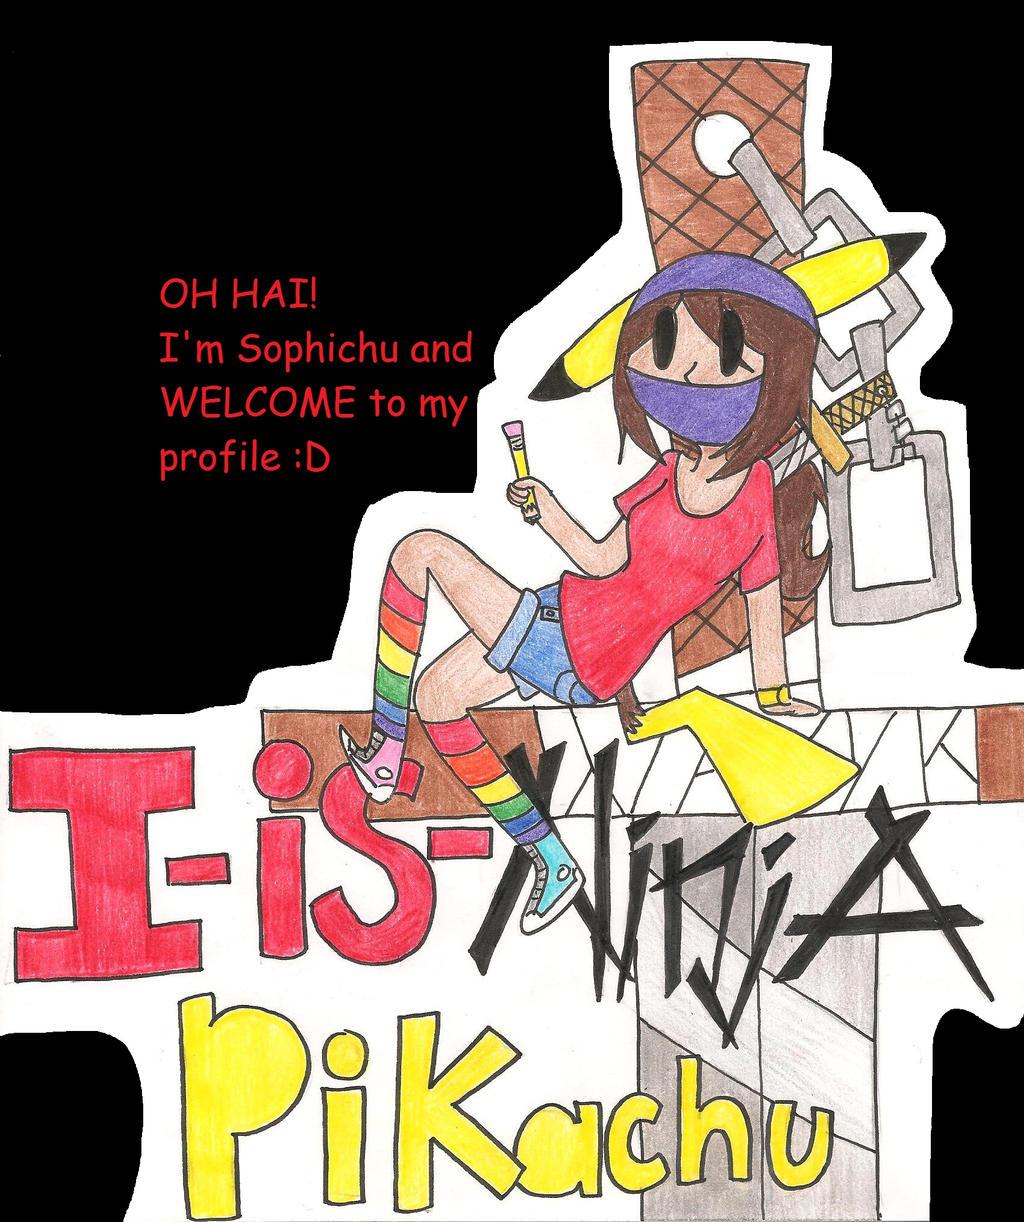 I-is-Ninja-Pikachu's Profile Picture